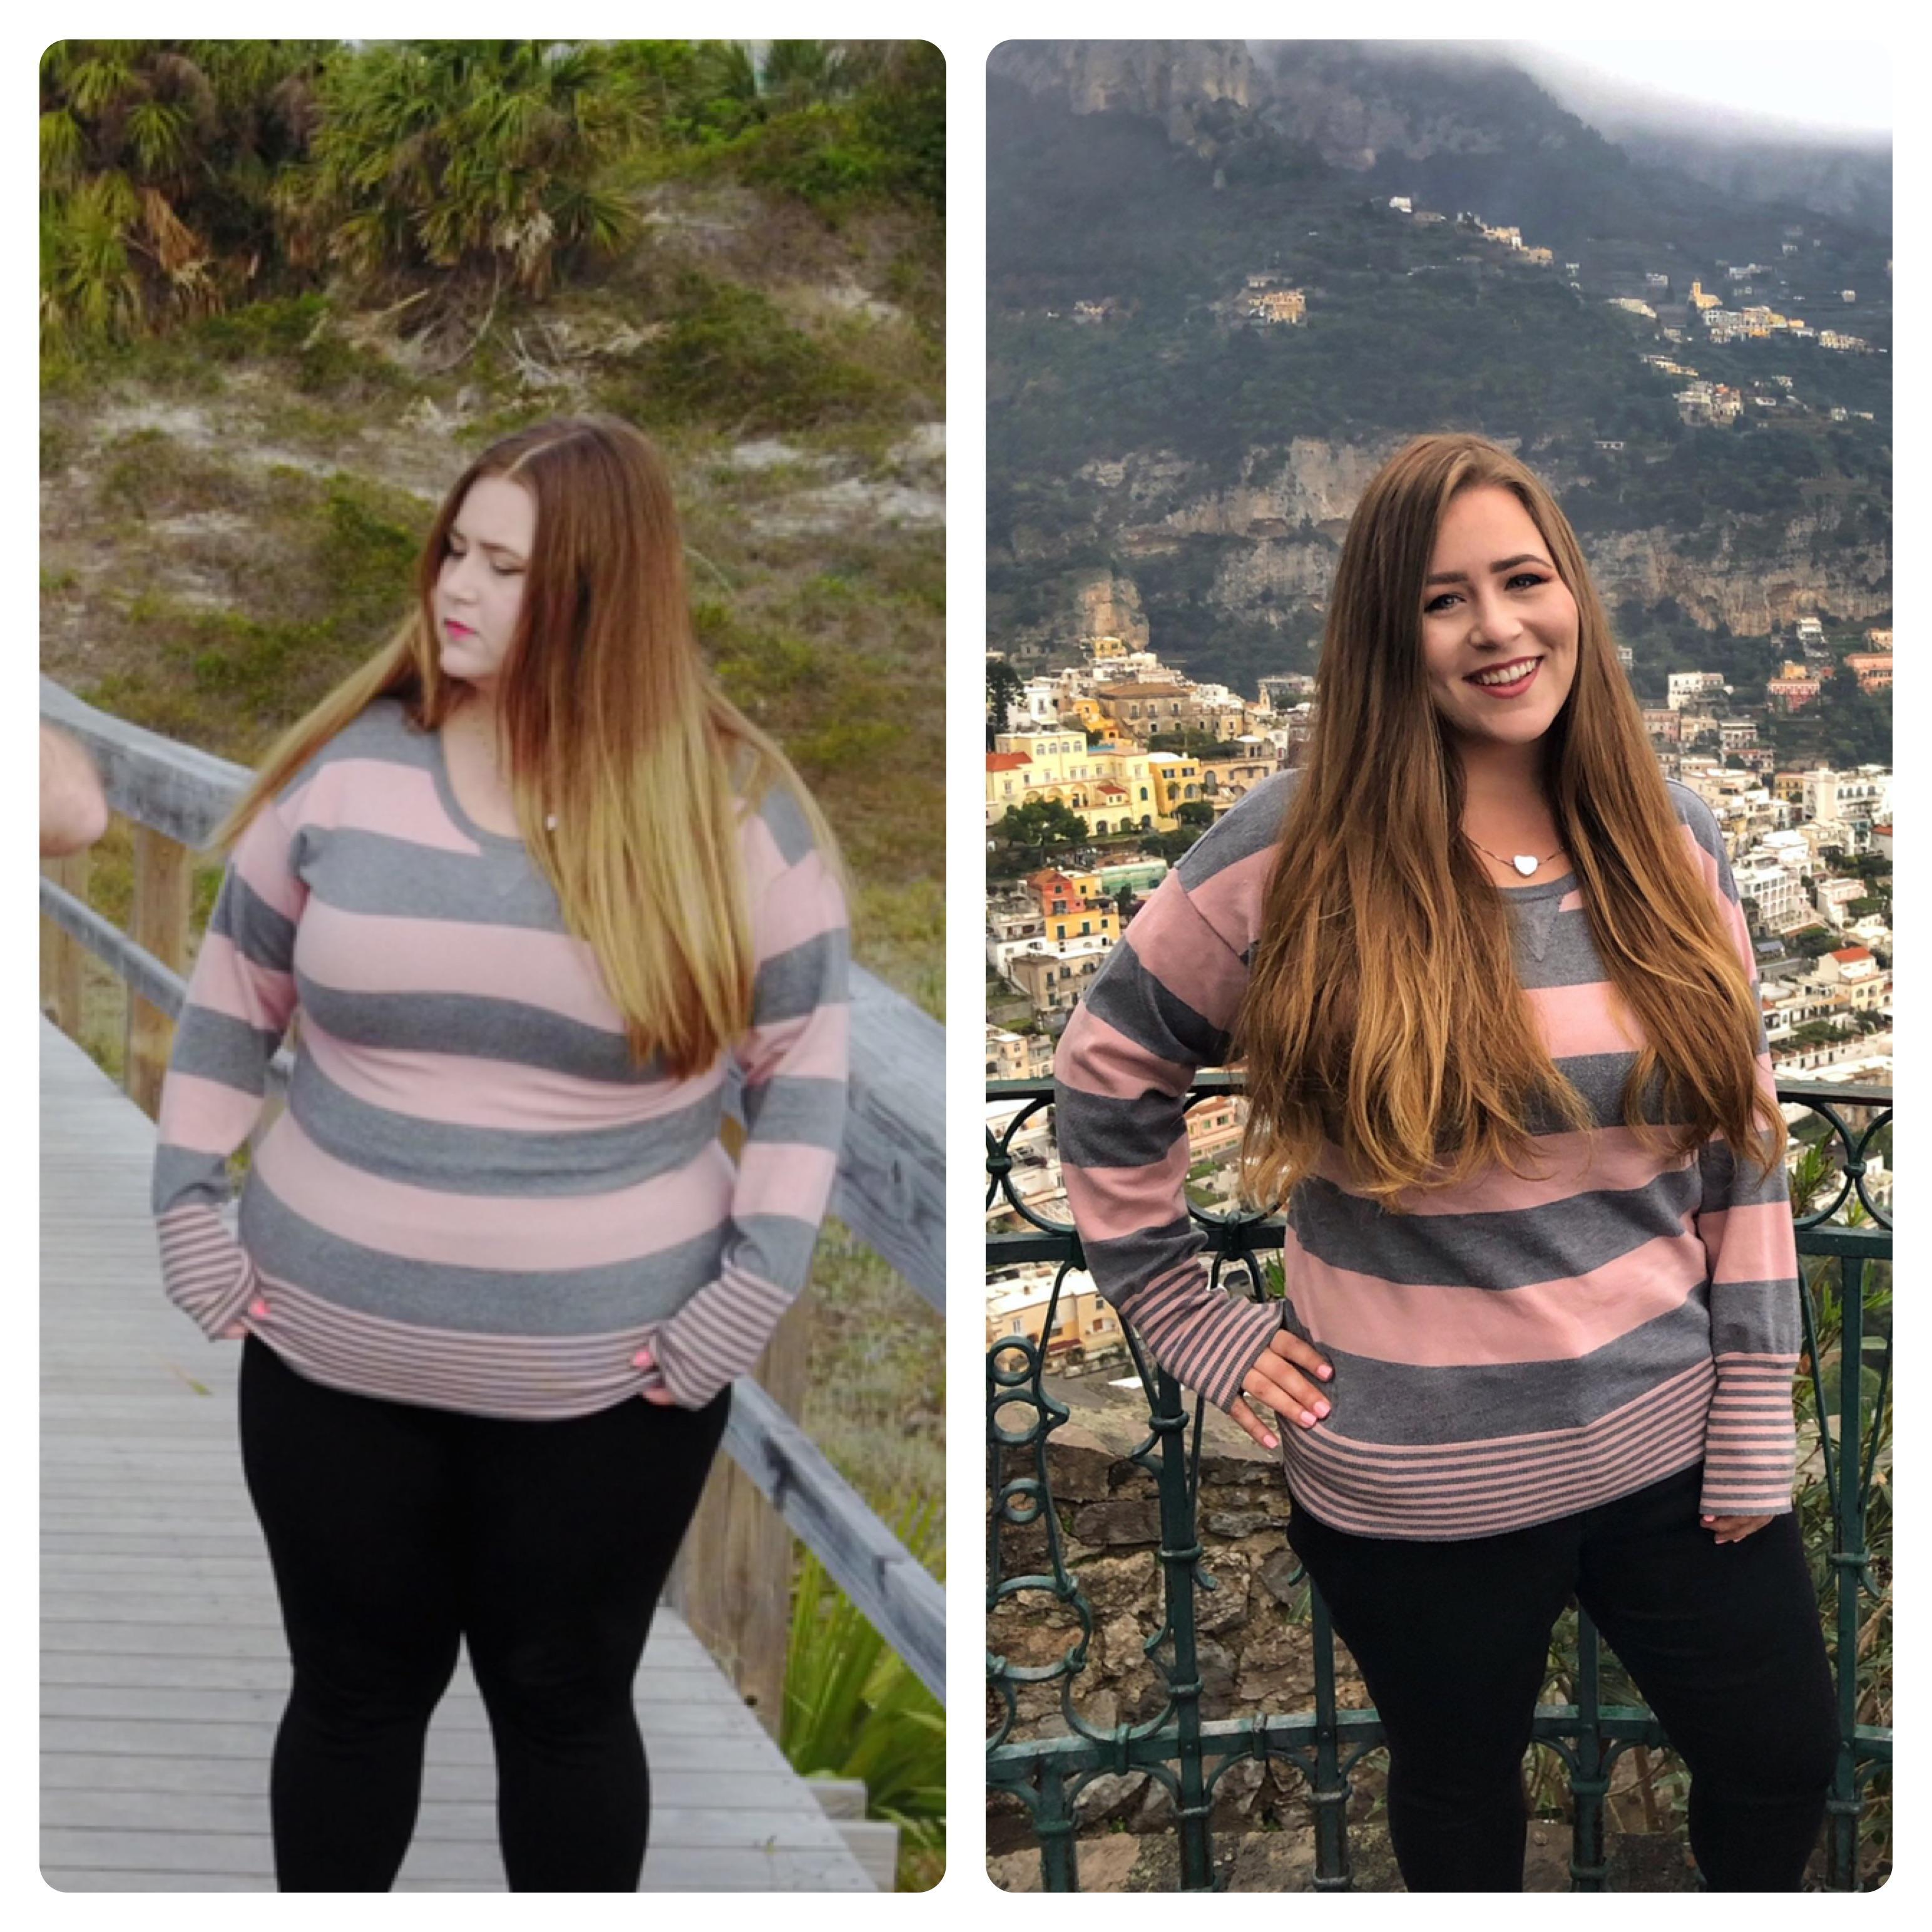 5 foot 8 Female 82 lbs Fat Loss 280 lbs to 198 lbs